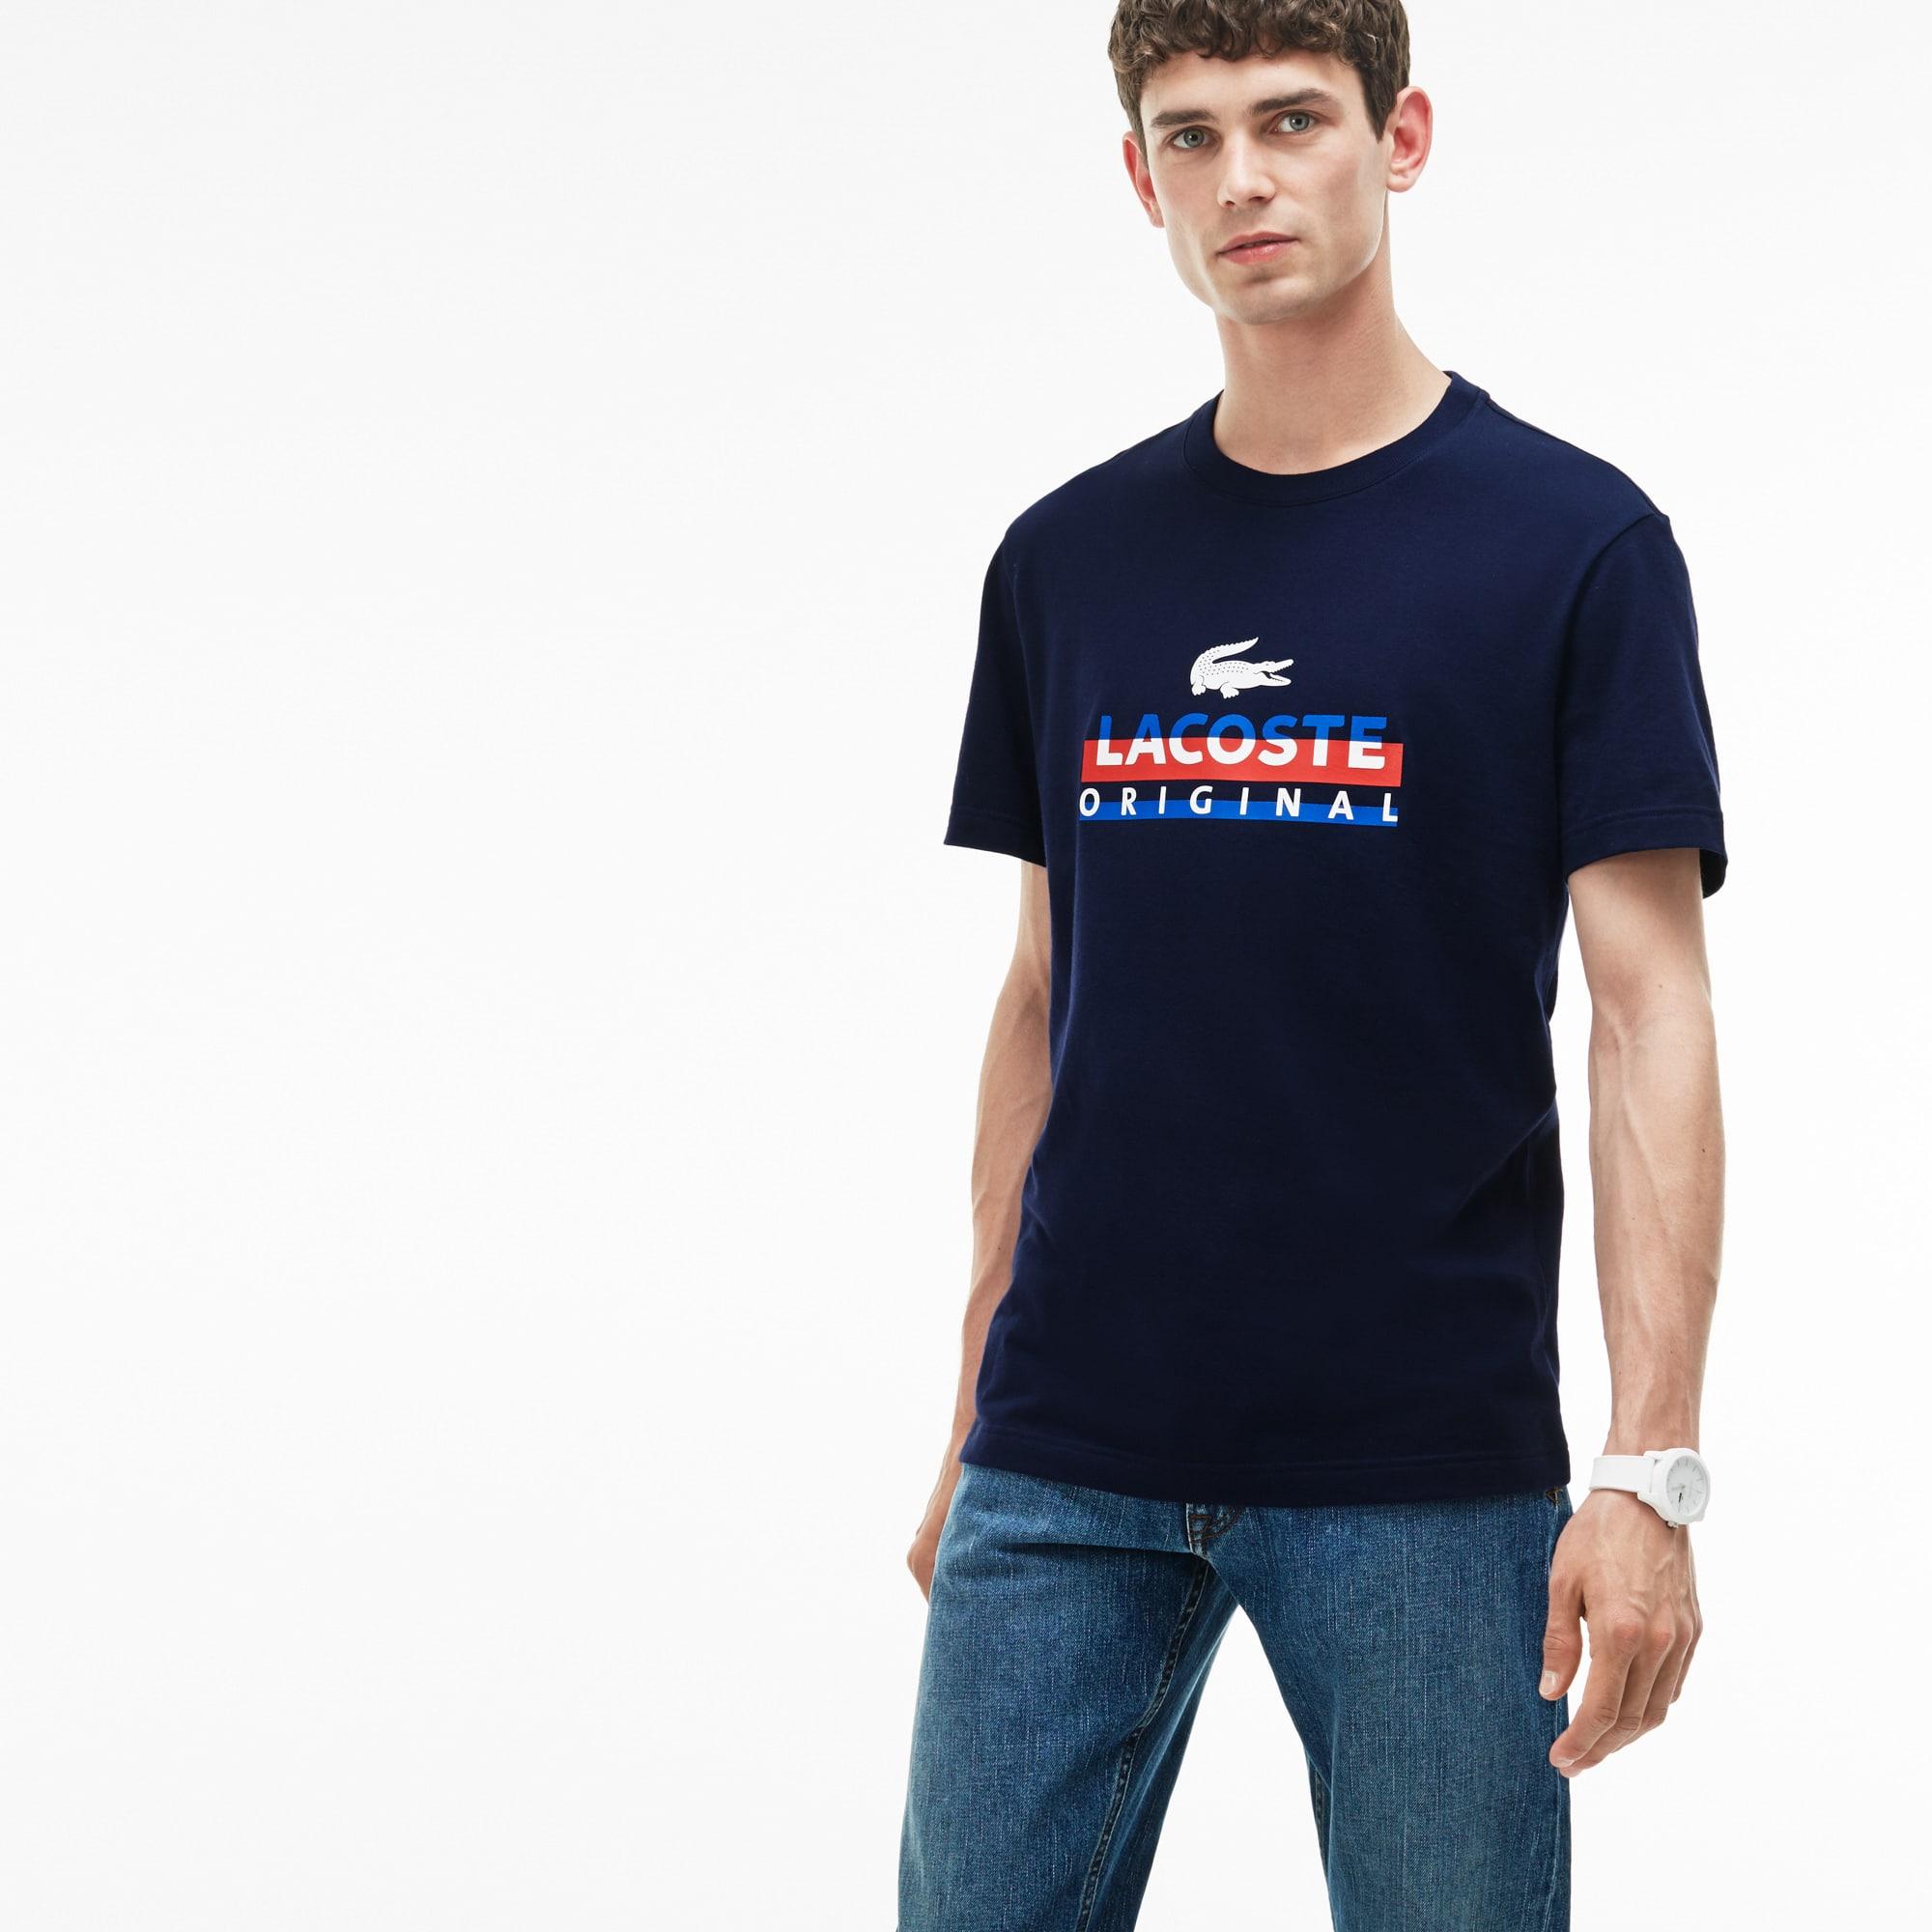 Men's Crew Neck Lettering Print Jersey T-Shirt